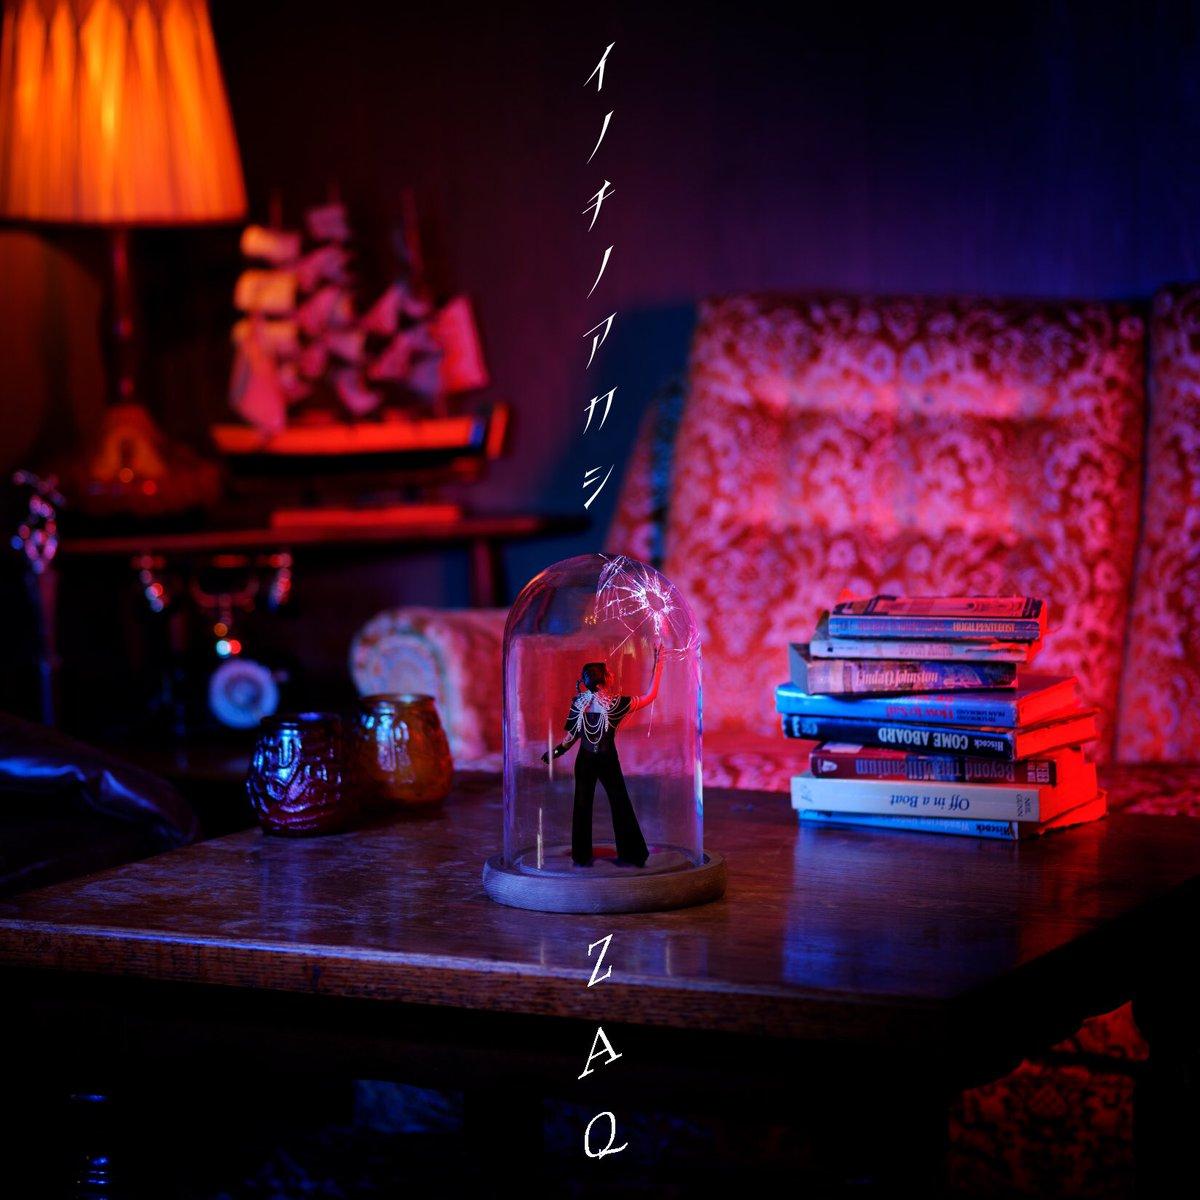 『ZAQ - Closed Ovation』収録の『イノチノアカシ』ジャケット